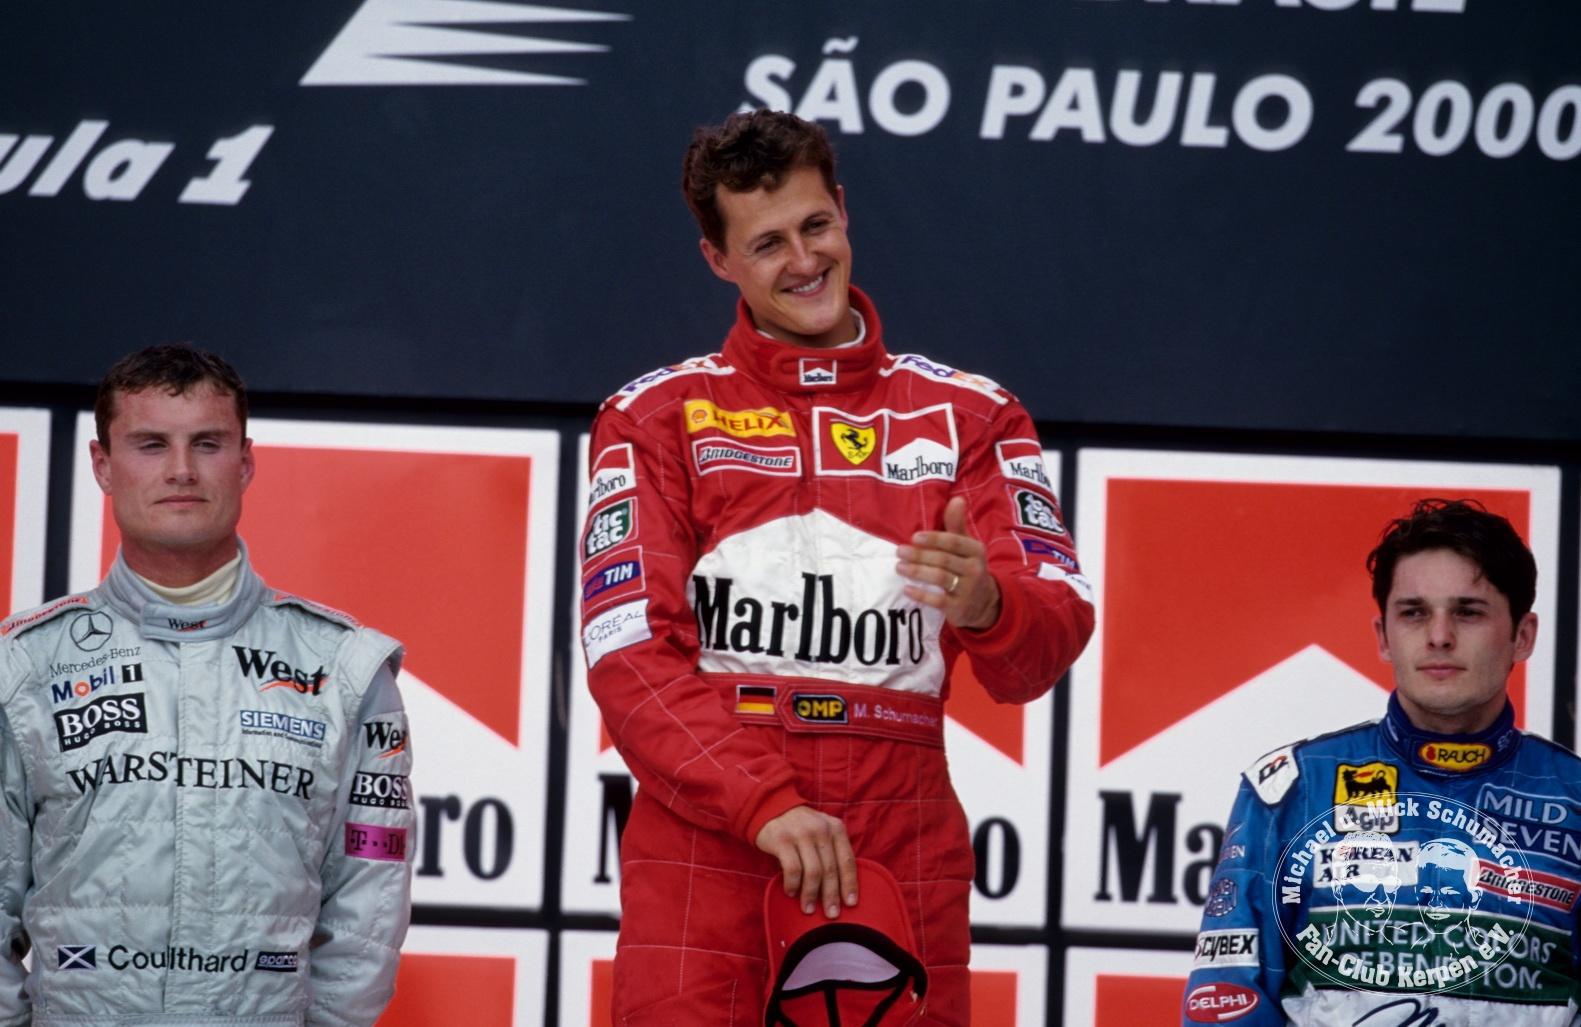 Formel 1, Grand Prix Brasilien 2000, Interlagos, 26.03.2000